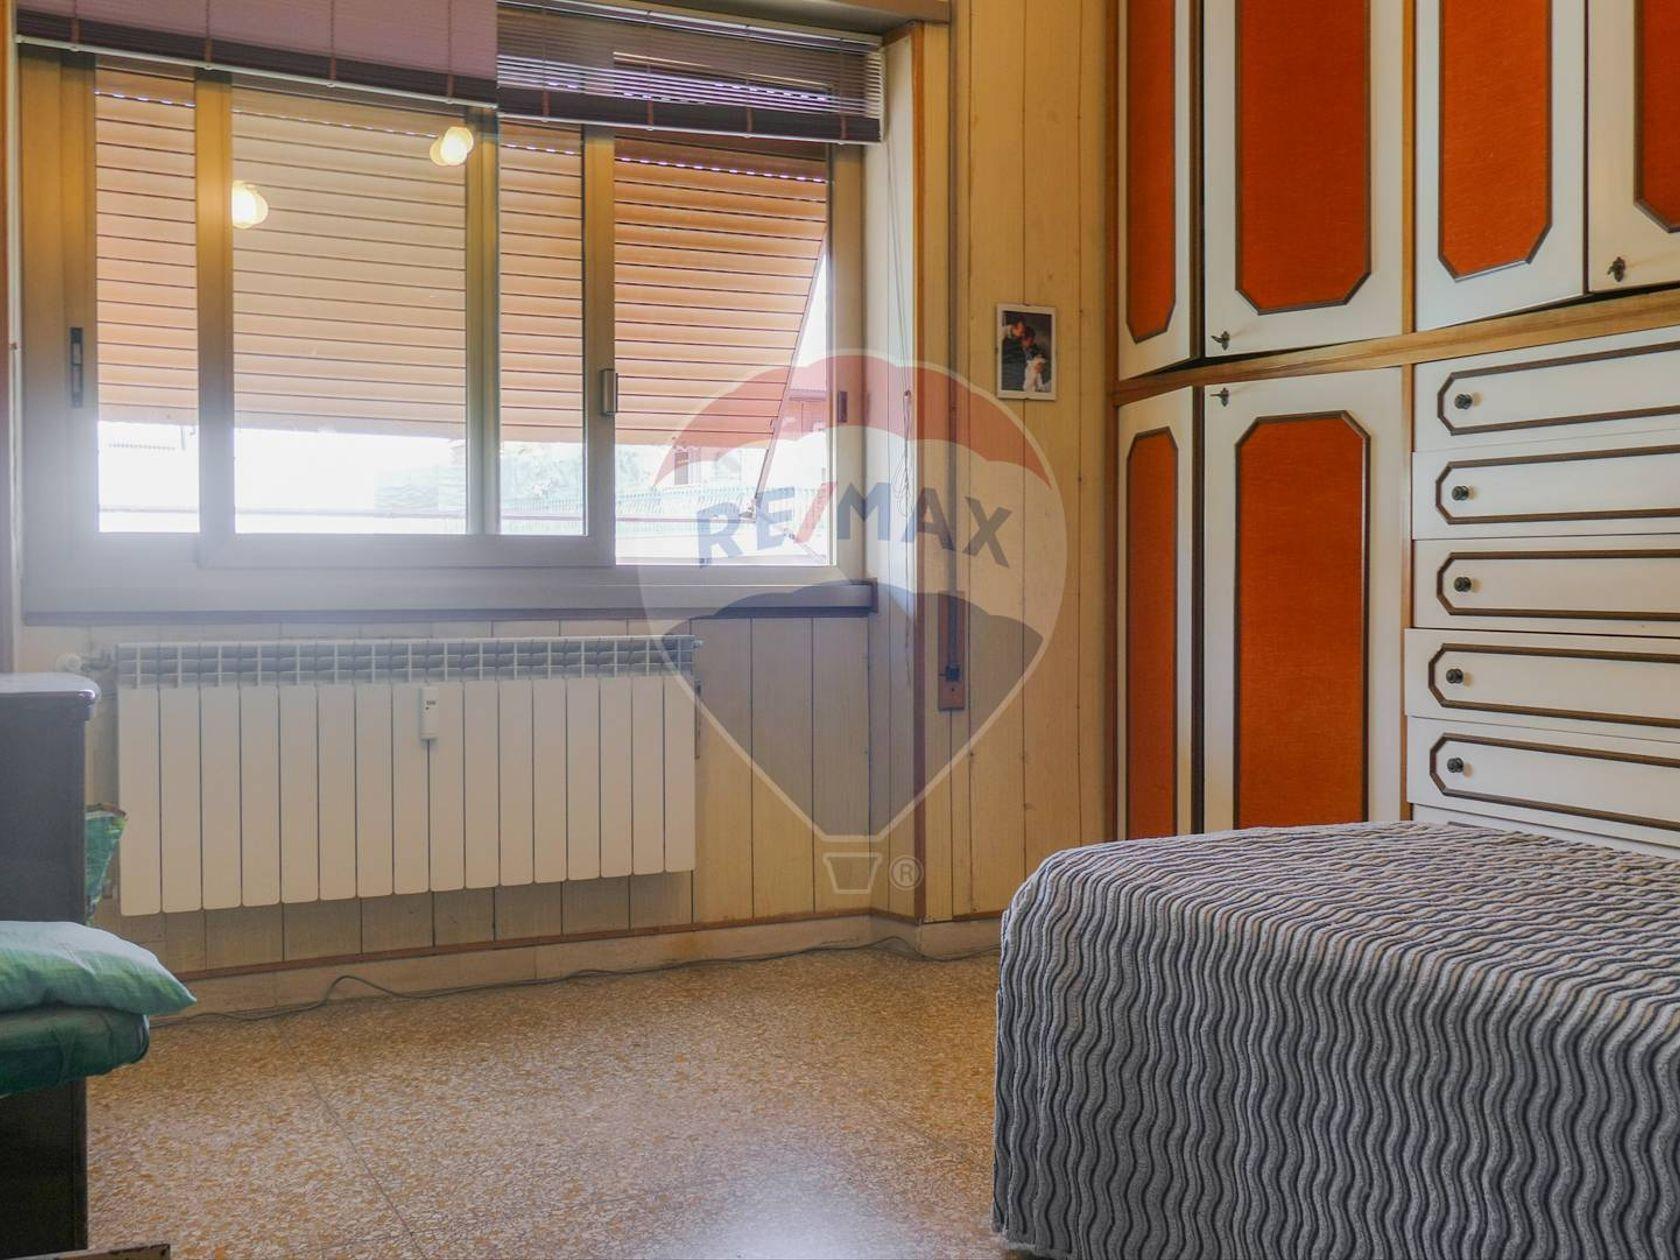 Attico/Mansarda Ostia, Roma, RM Vendita - Foto 23